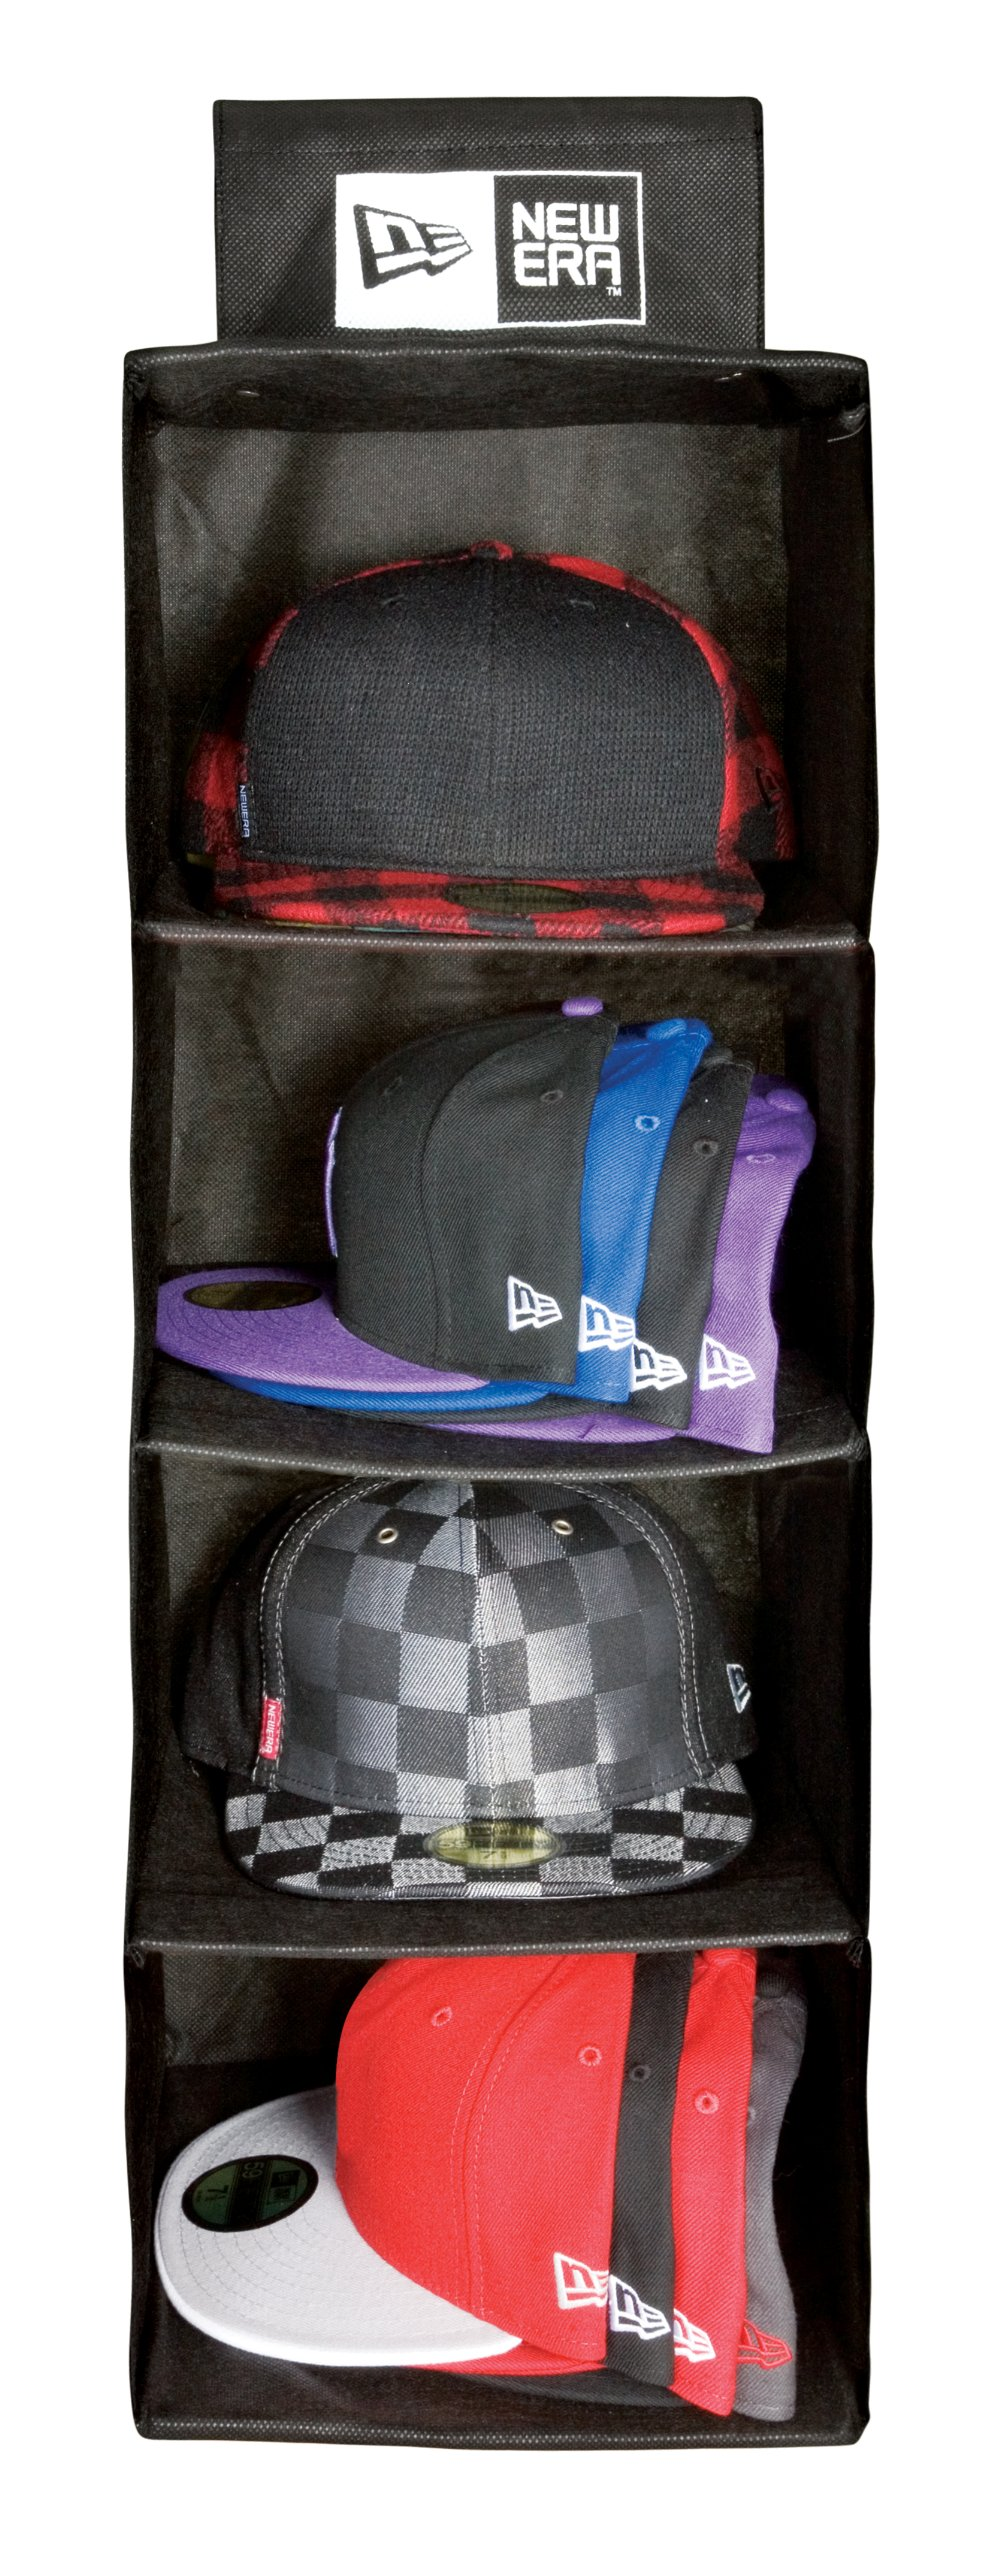 New Era Cap Storage System Baseball Hat Holder Rack Wall Hooks Organizer  Black c4befb569e2